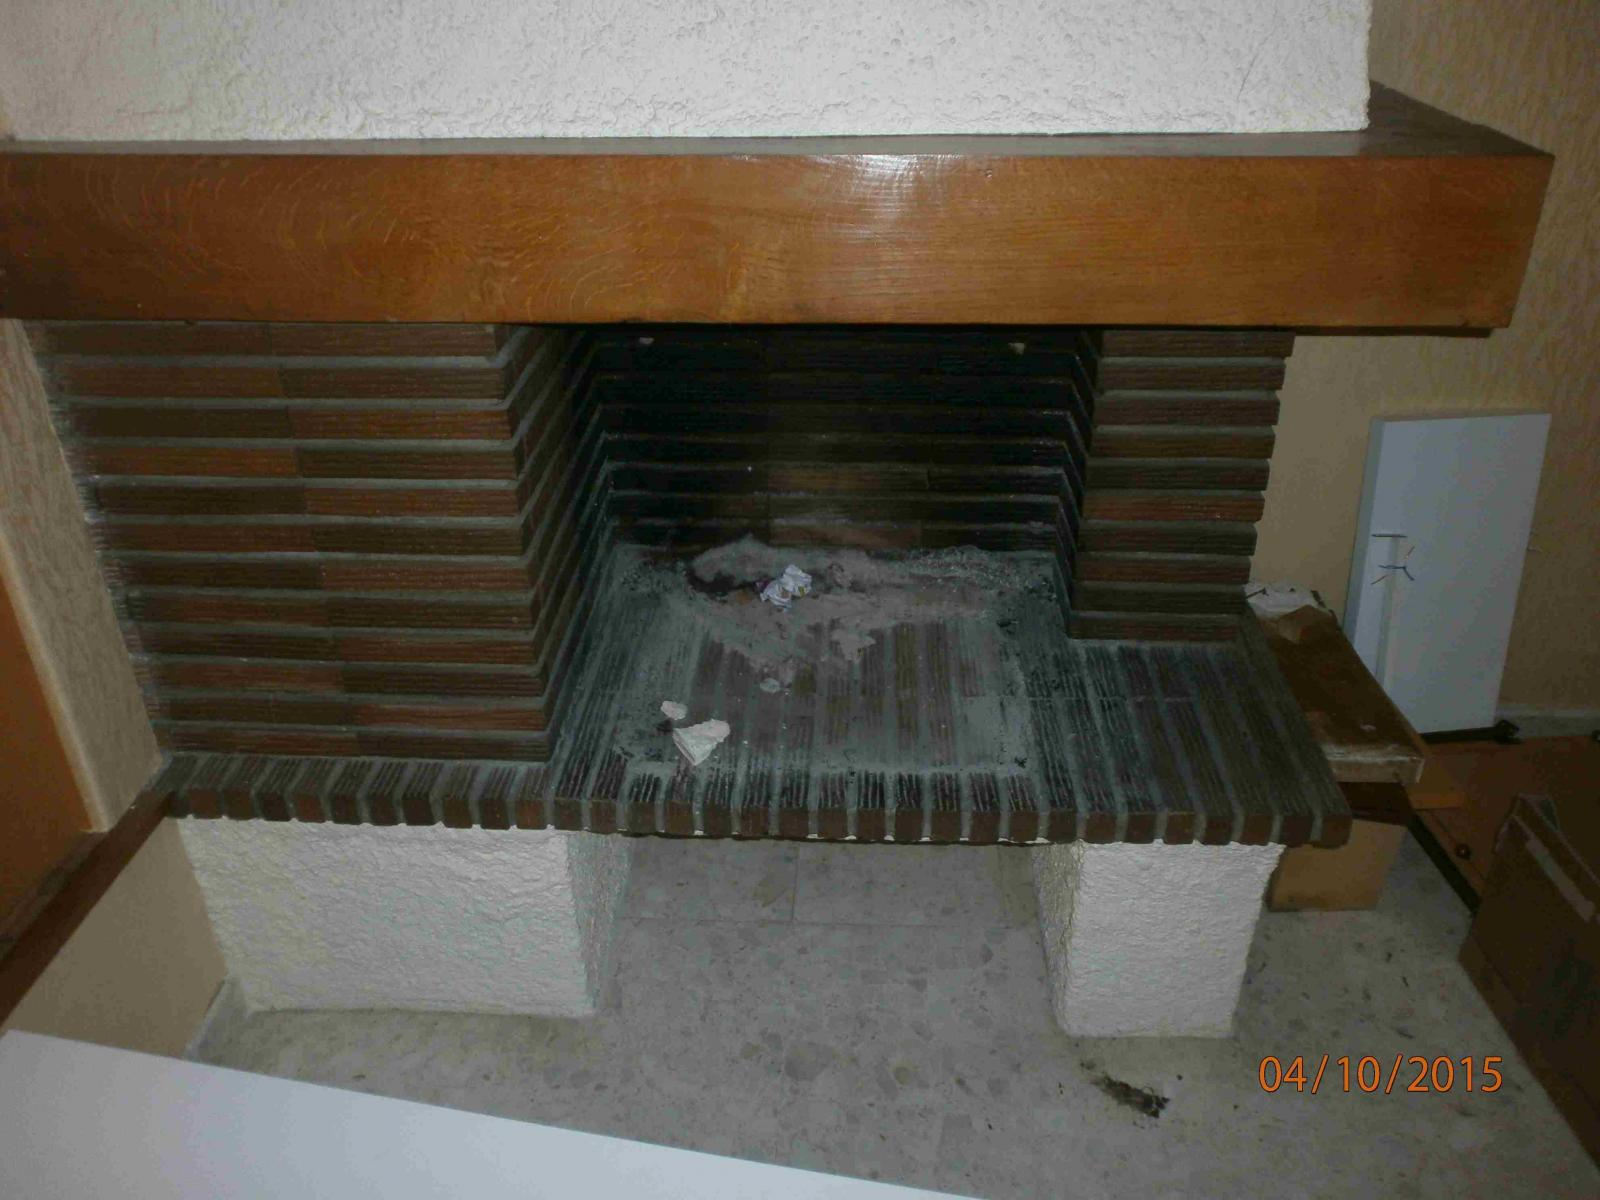 Hotte de chemin e - Decoration hotte de cheminee ...